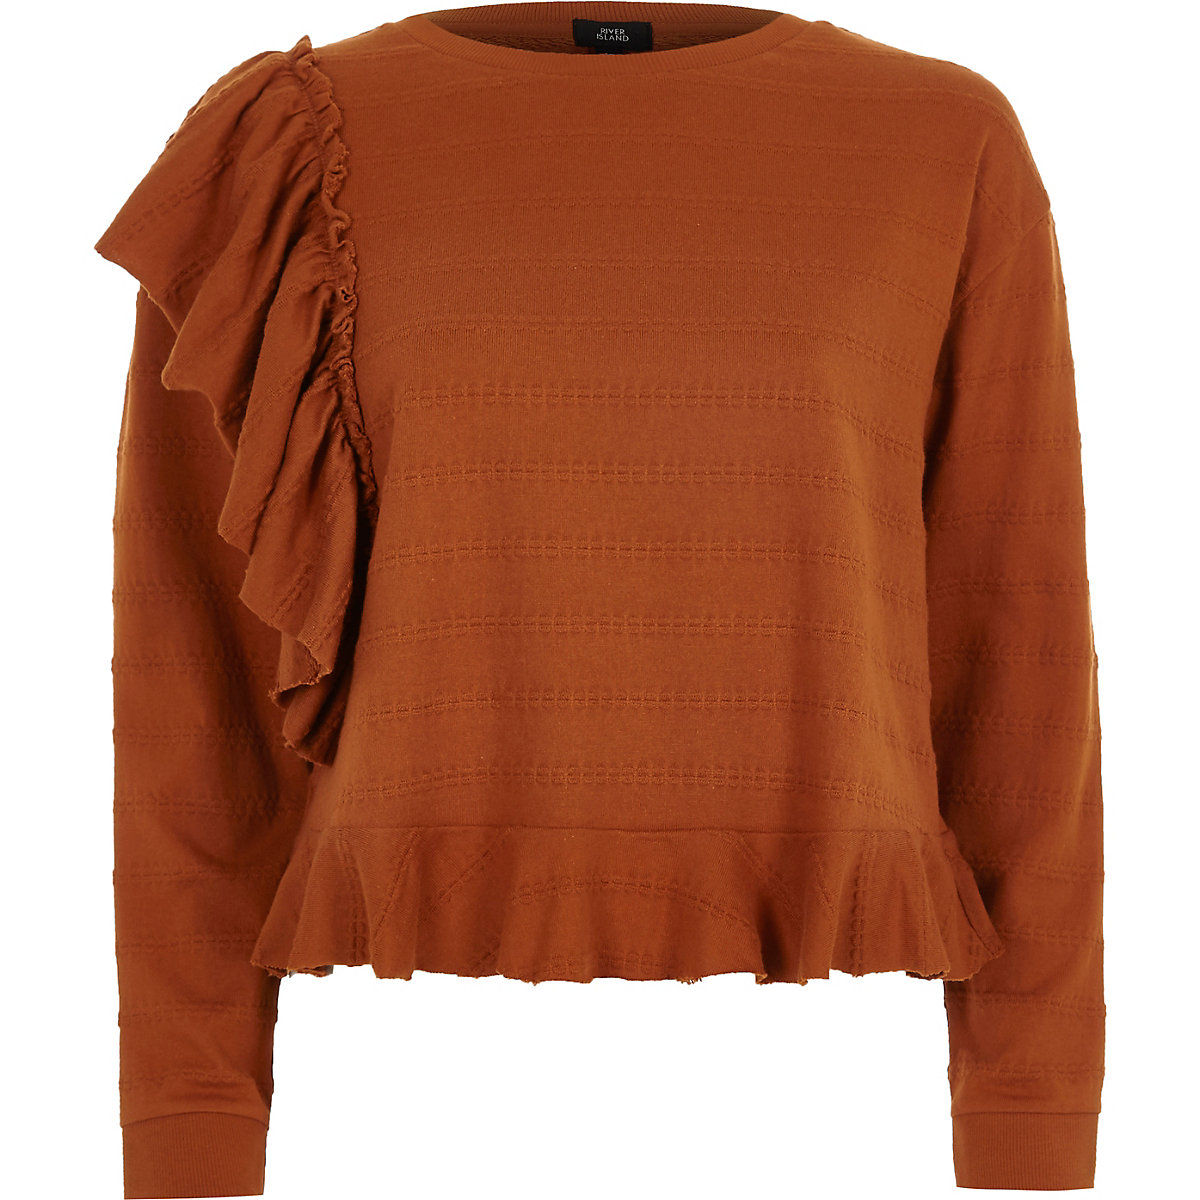 Brown jacquard frill long sleeve top